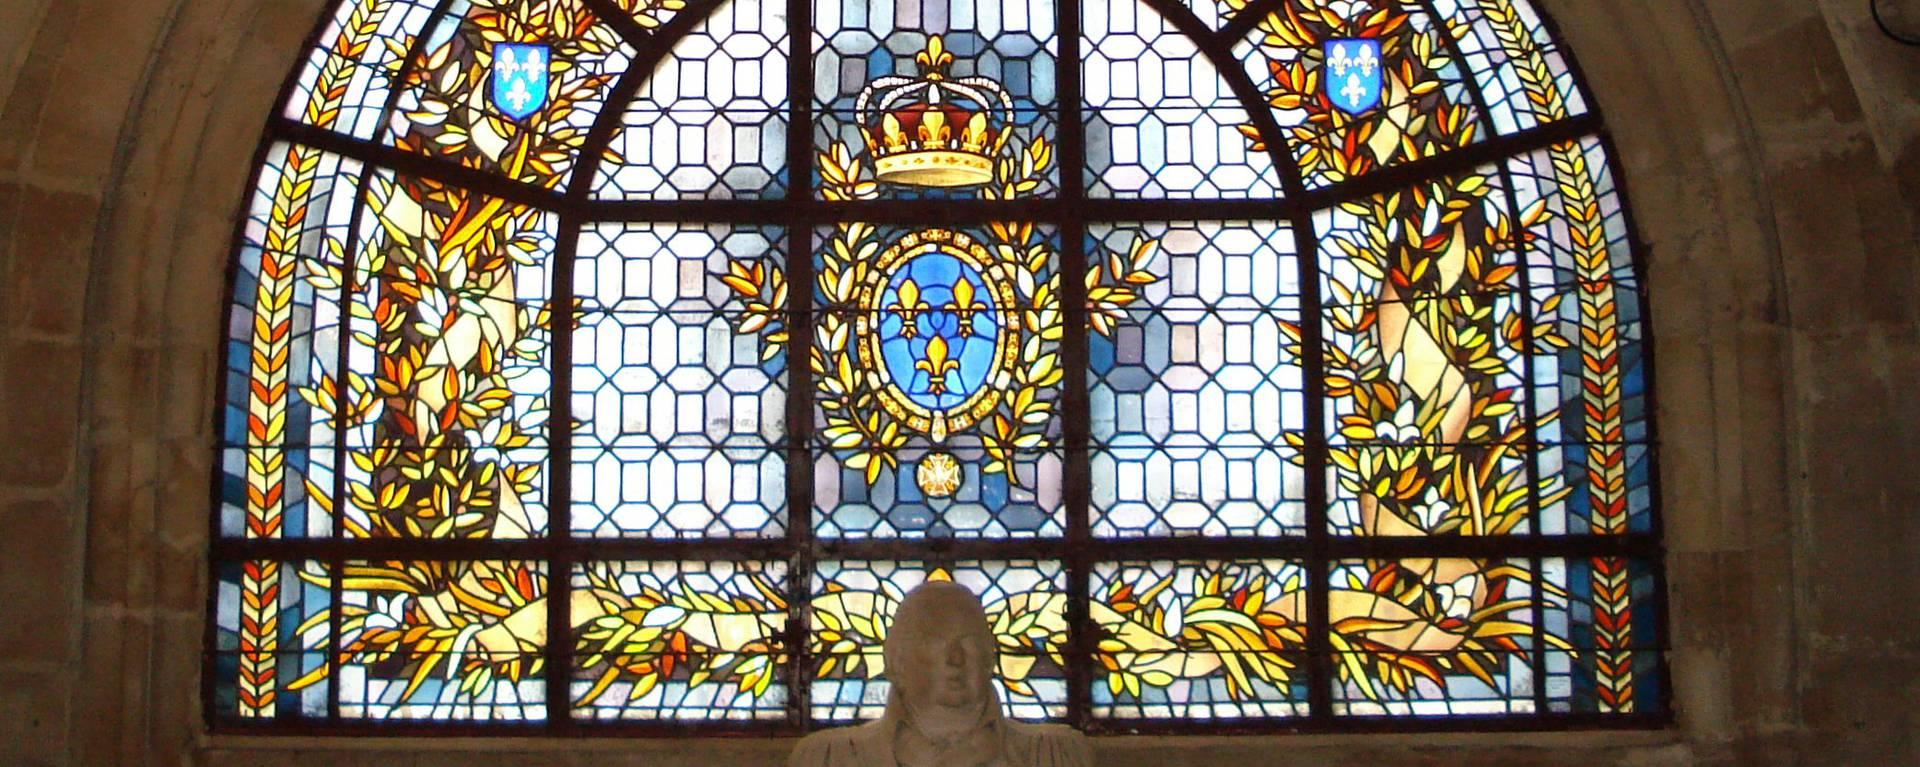 stained glass in the crypt of the Basilica- © Office de Tourisme de Plaine Commune Grand Paris